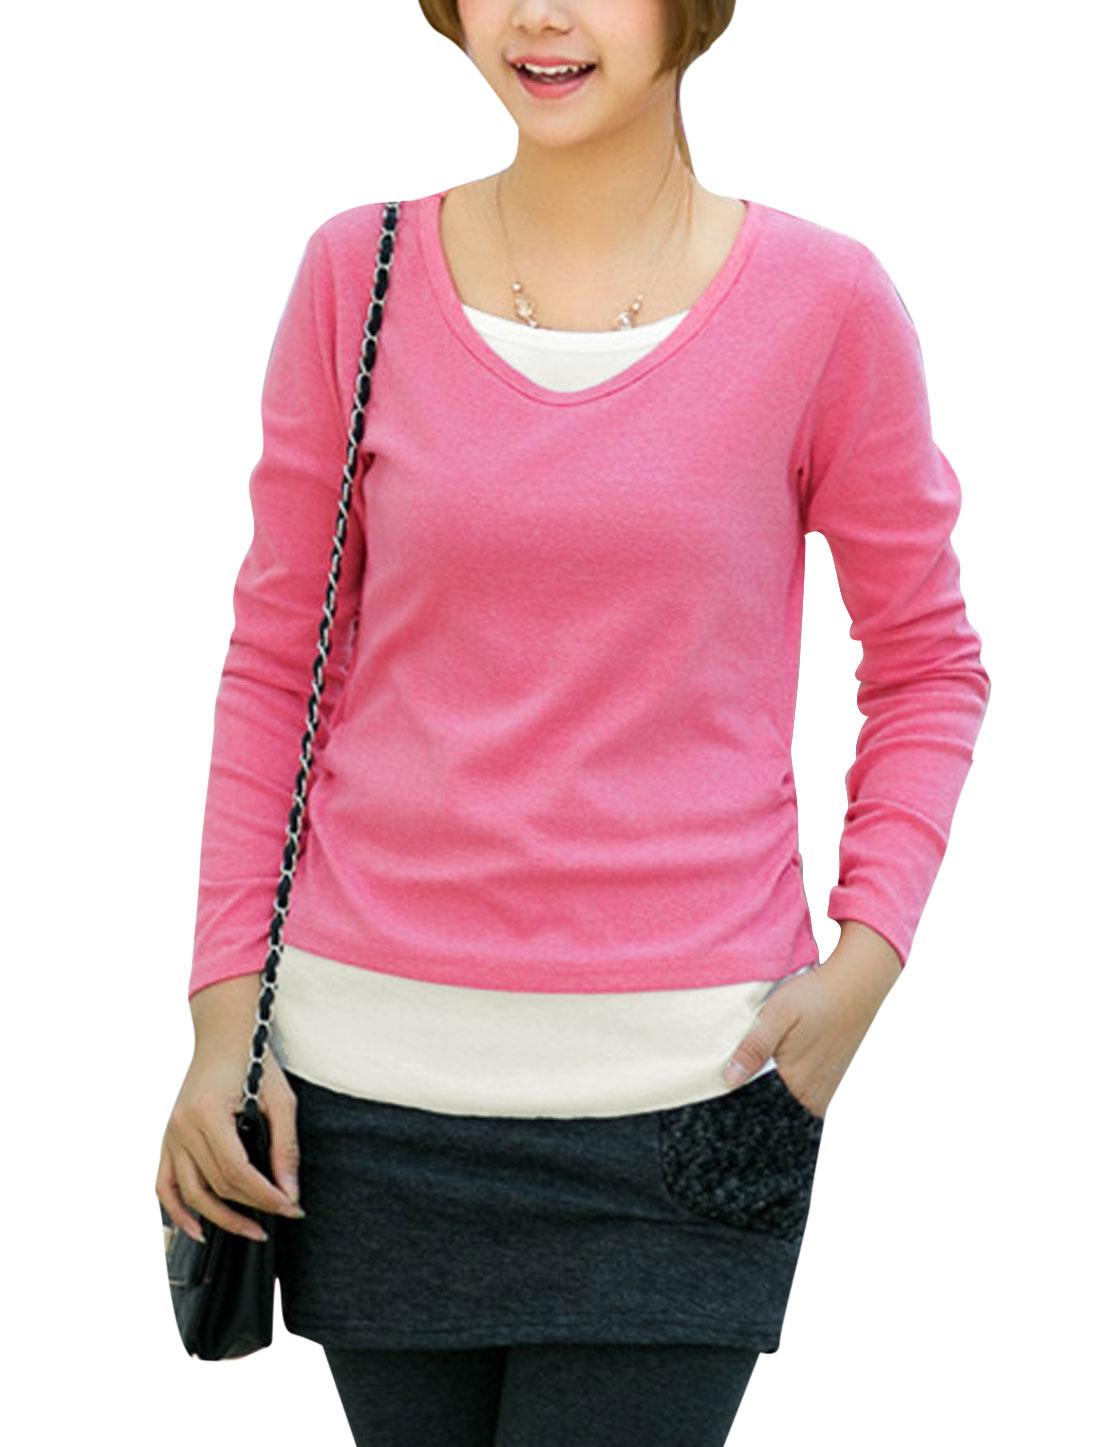 Ladies Pullover Long Sleeve Panel Tee Shirt Pink S